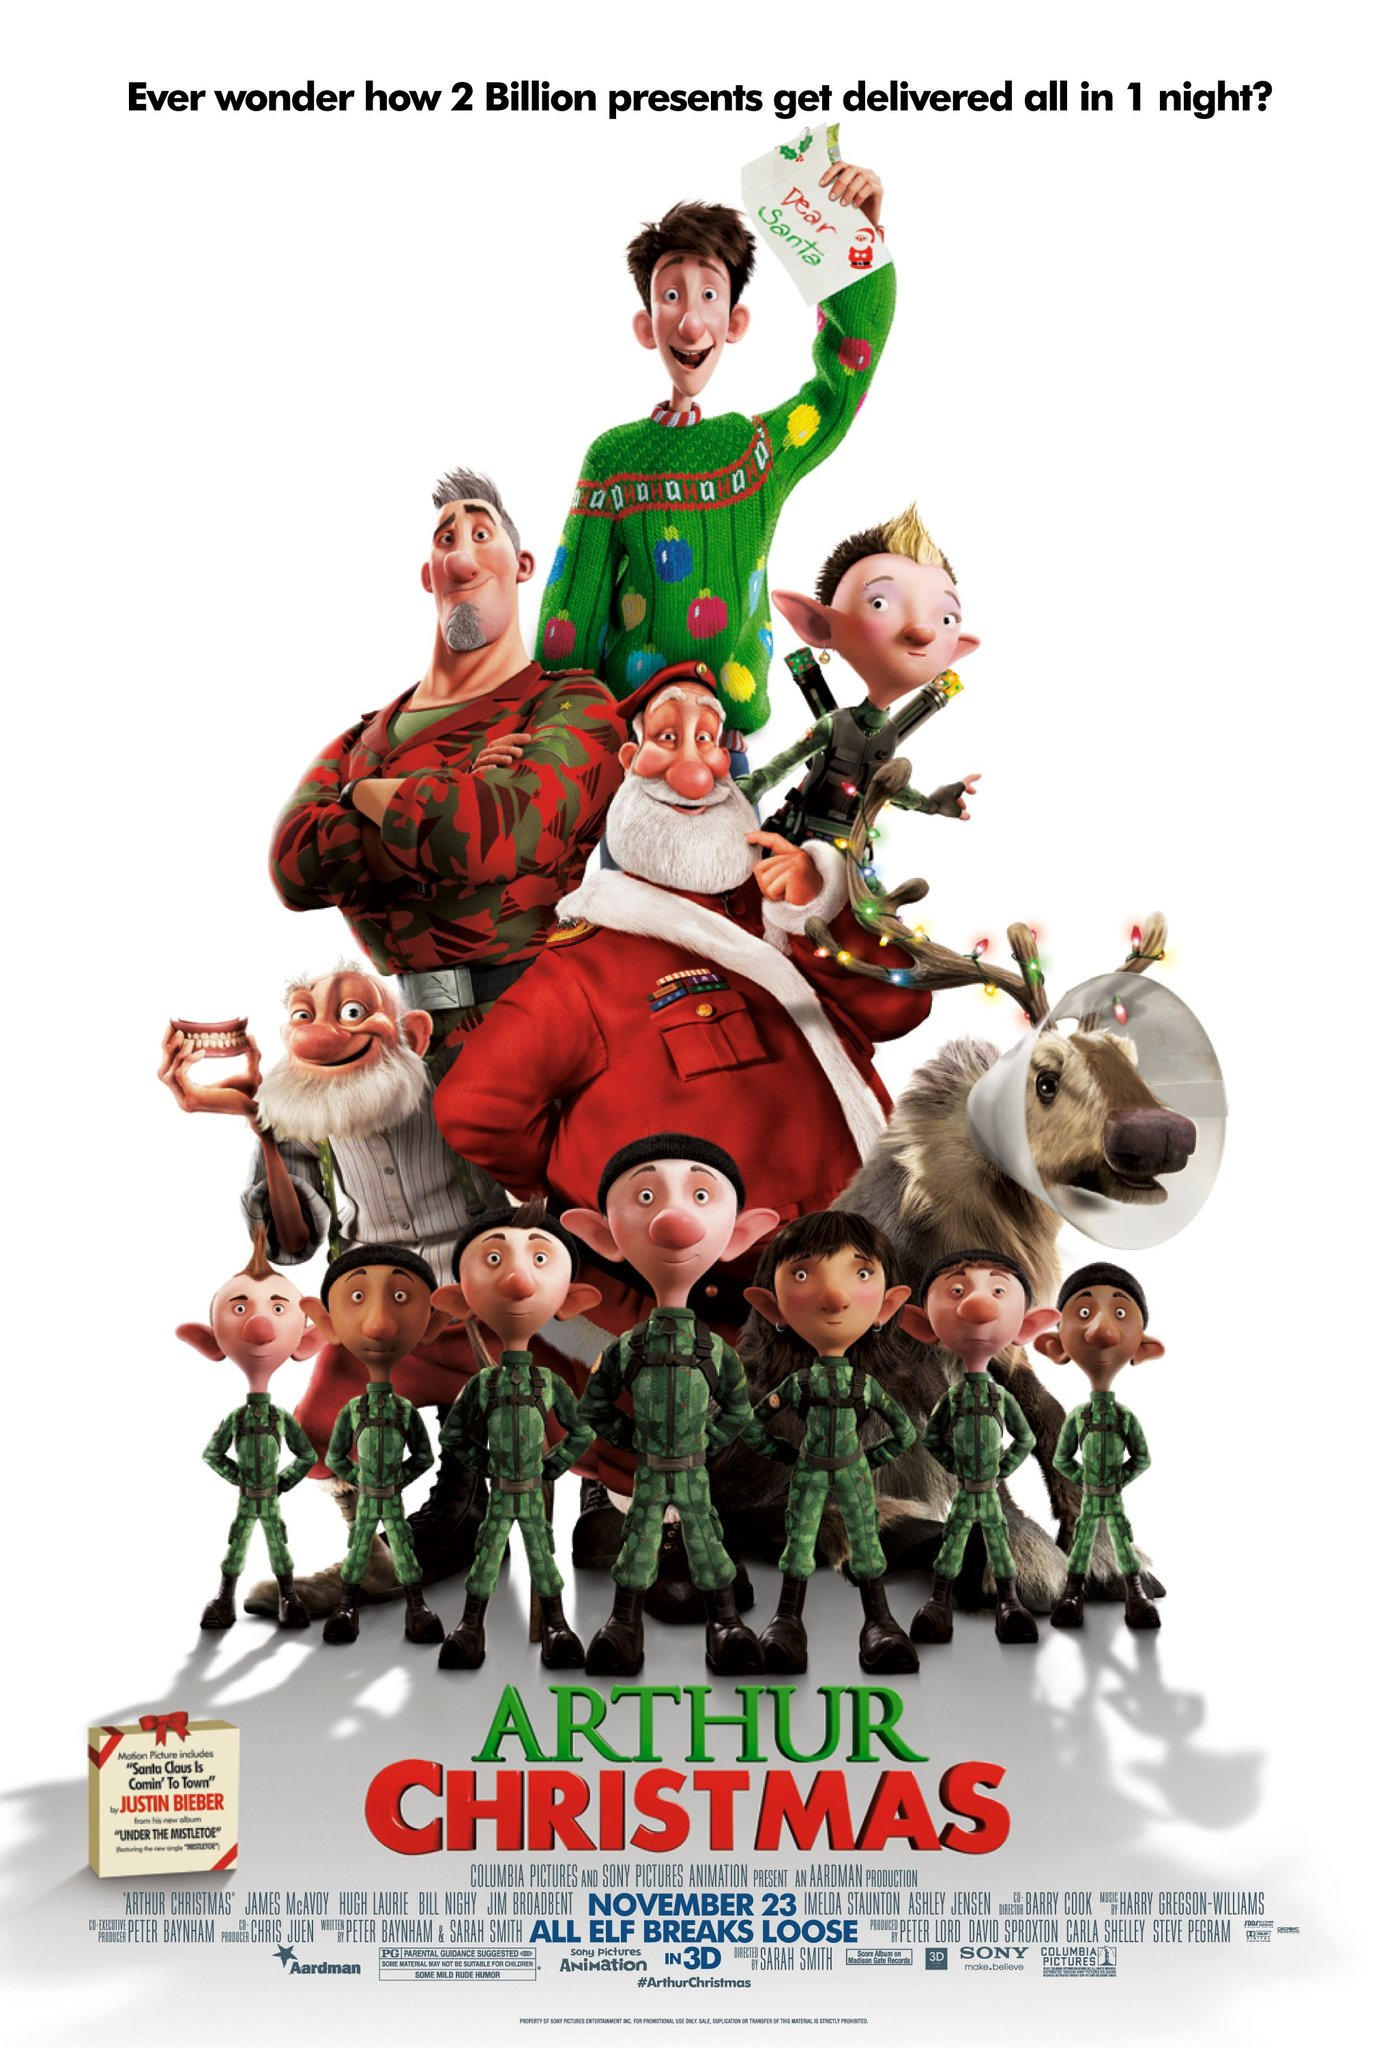 The poster for Arthur Christmas, 2011.